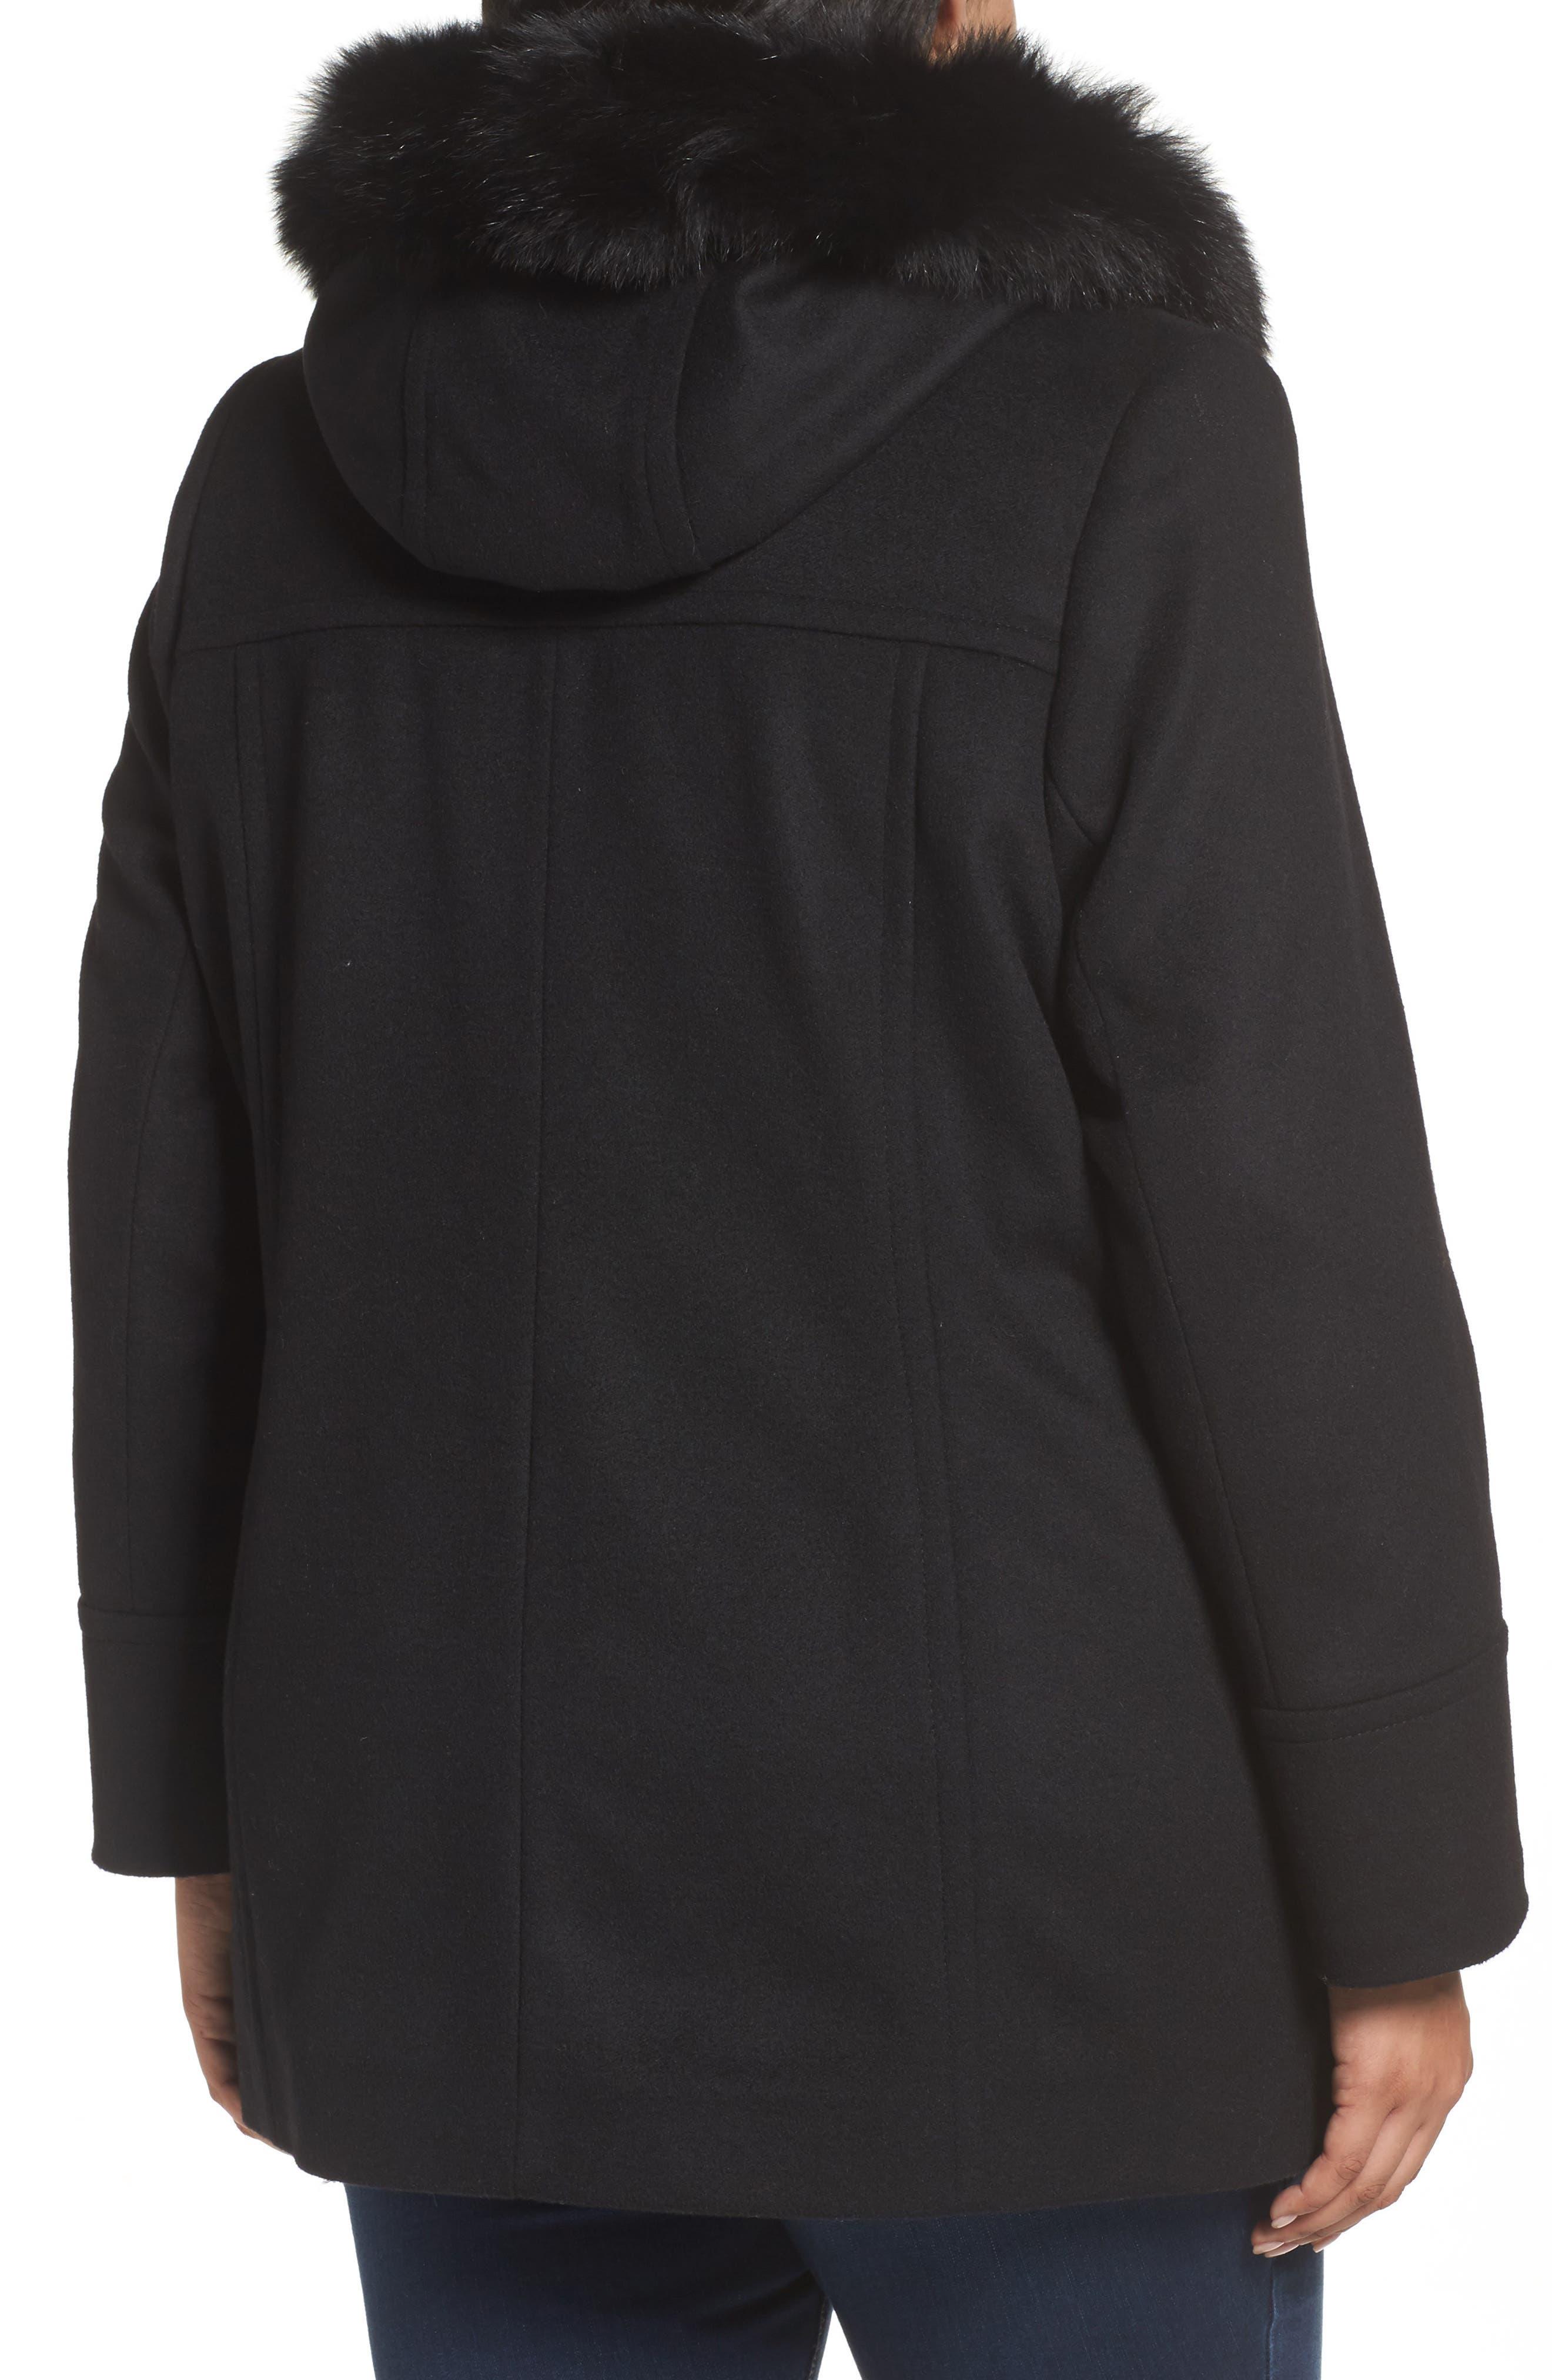 Alternate Image 2  - Sachi Hooded Wool Blend Coat with Genuine Fox Fur Trim (Regular & Petite)